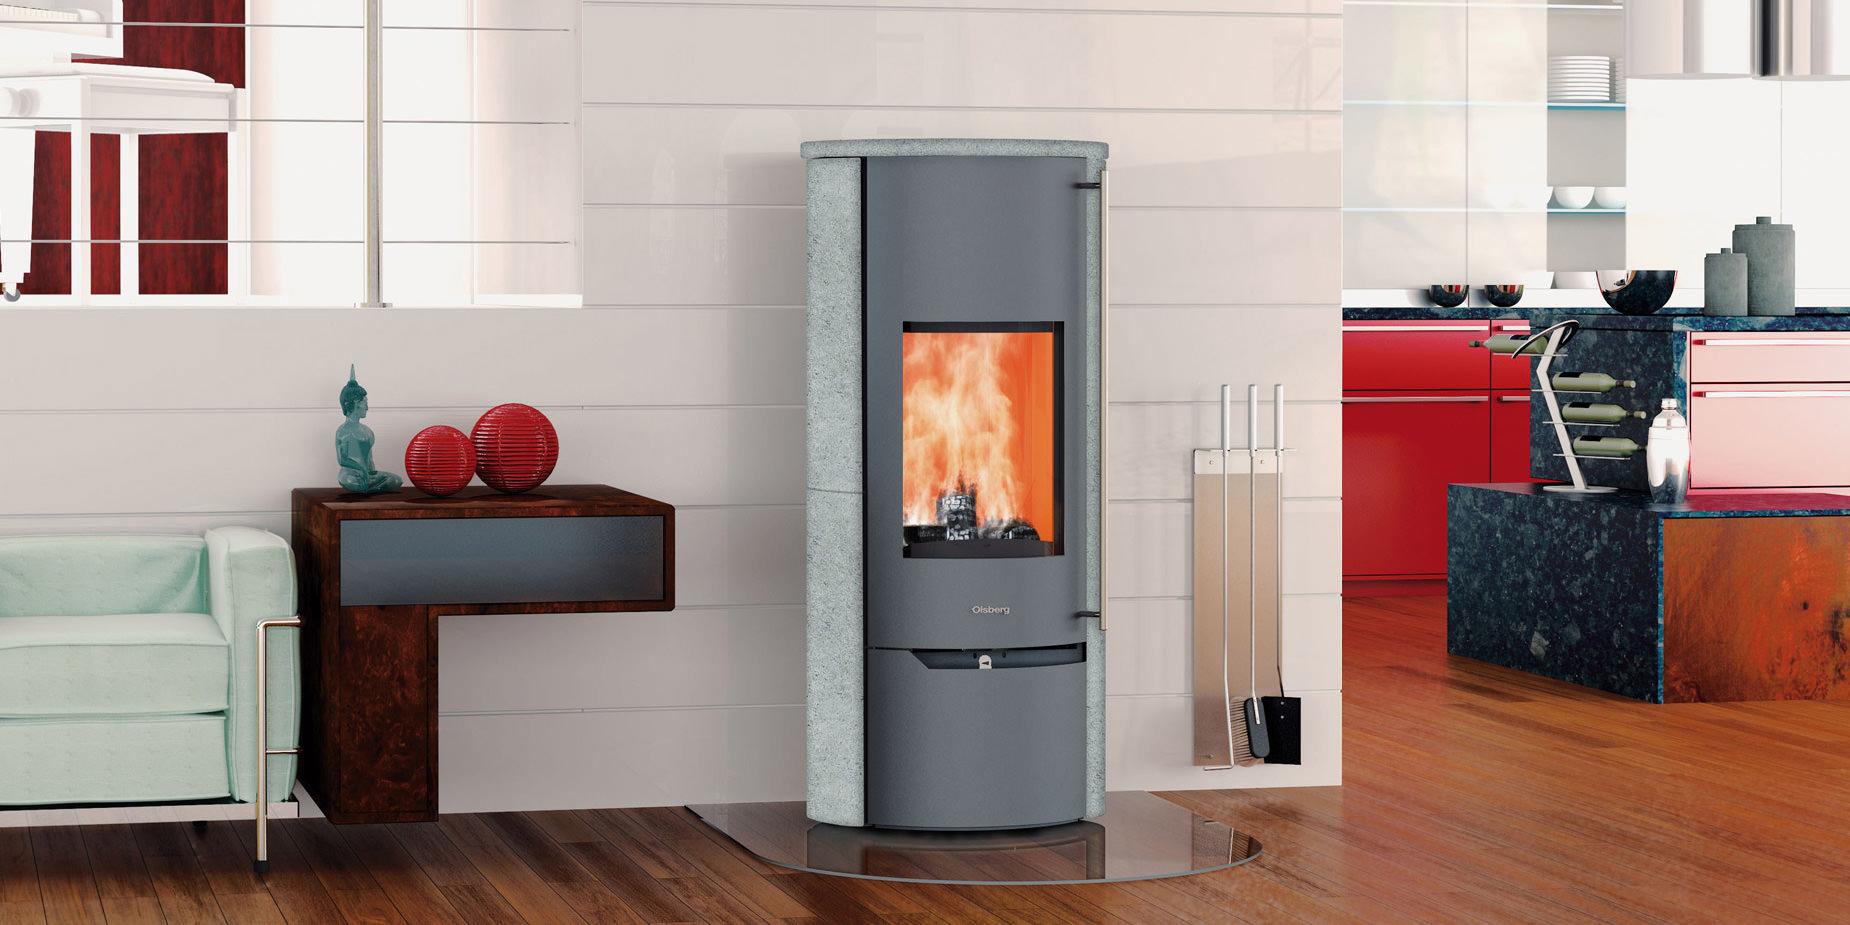 alpha solar kaminofen wassergef hrt holzofen olsberg tolima aqua compact 10 kw. Black Bedroom Furniture Sets. Home Design Ideas